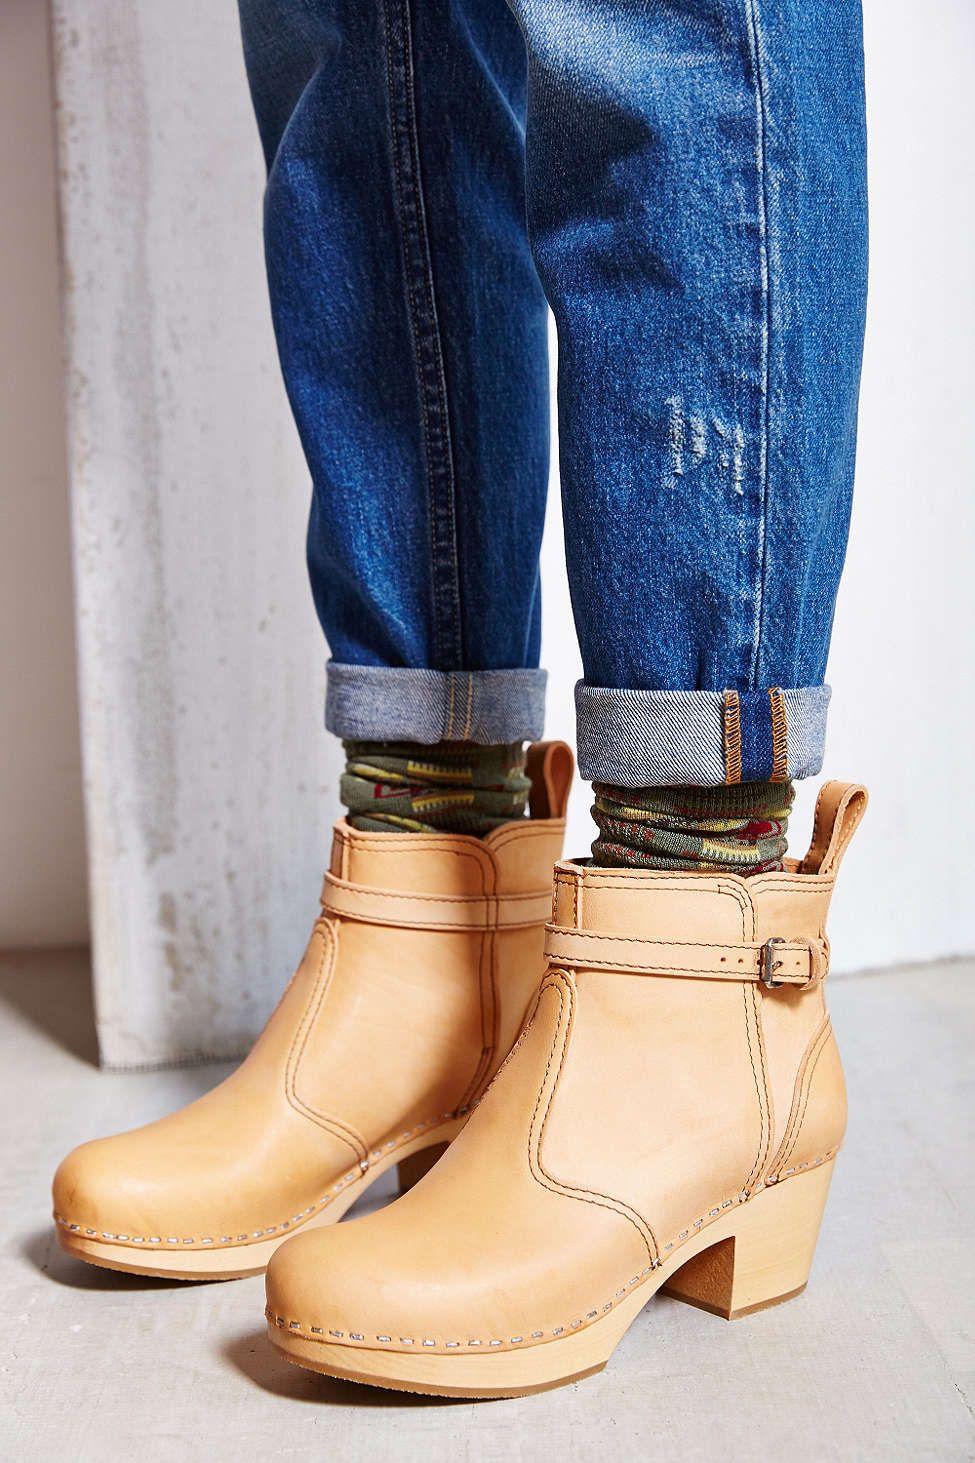 fb96843bd76 Swedish Hasbeens Jodhpur Boot - Urban Outfitters